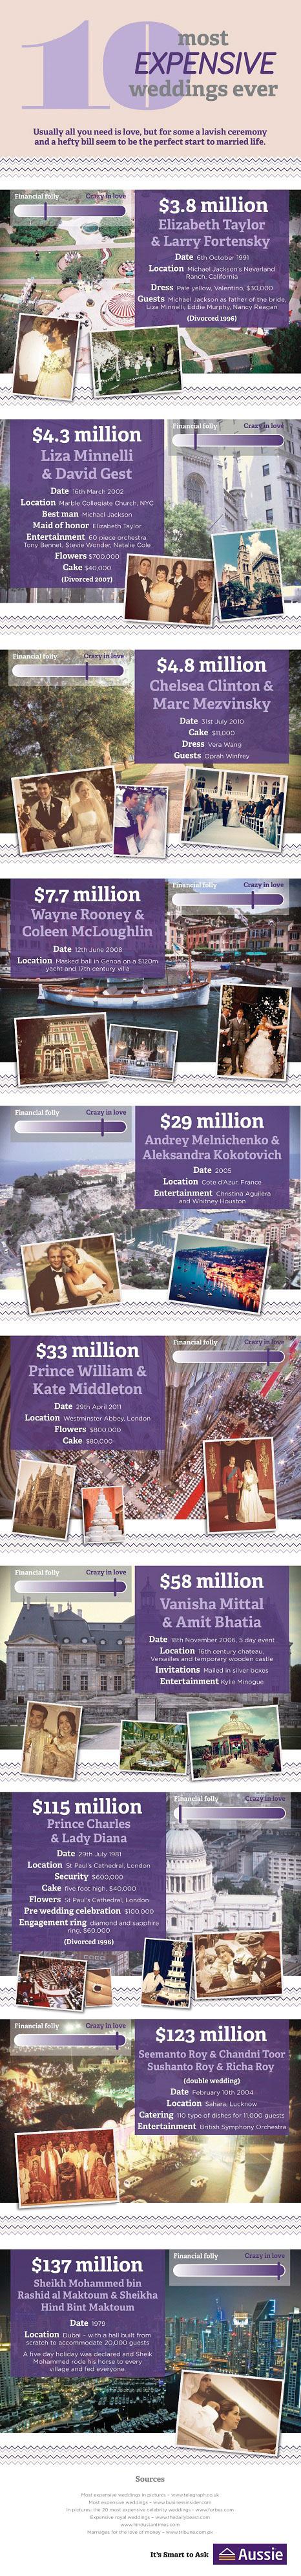 Million Dollar Weddings-Infographic